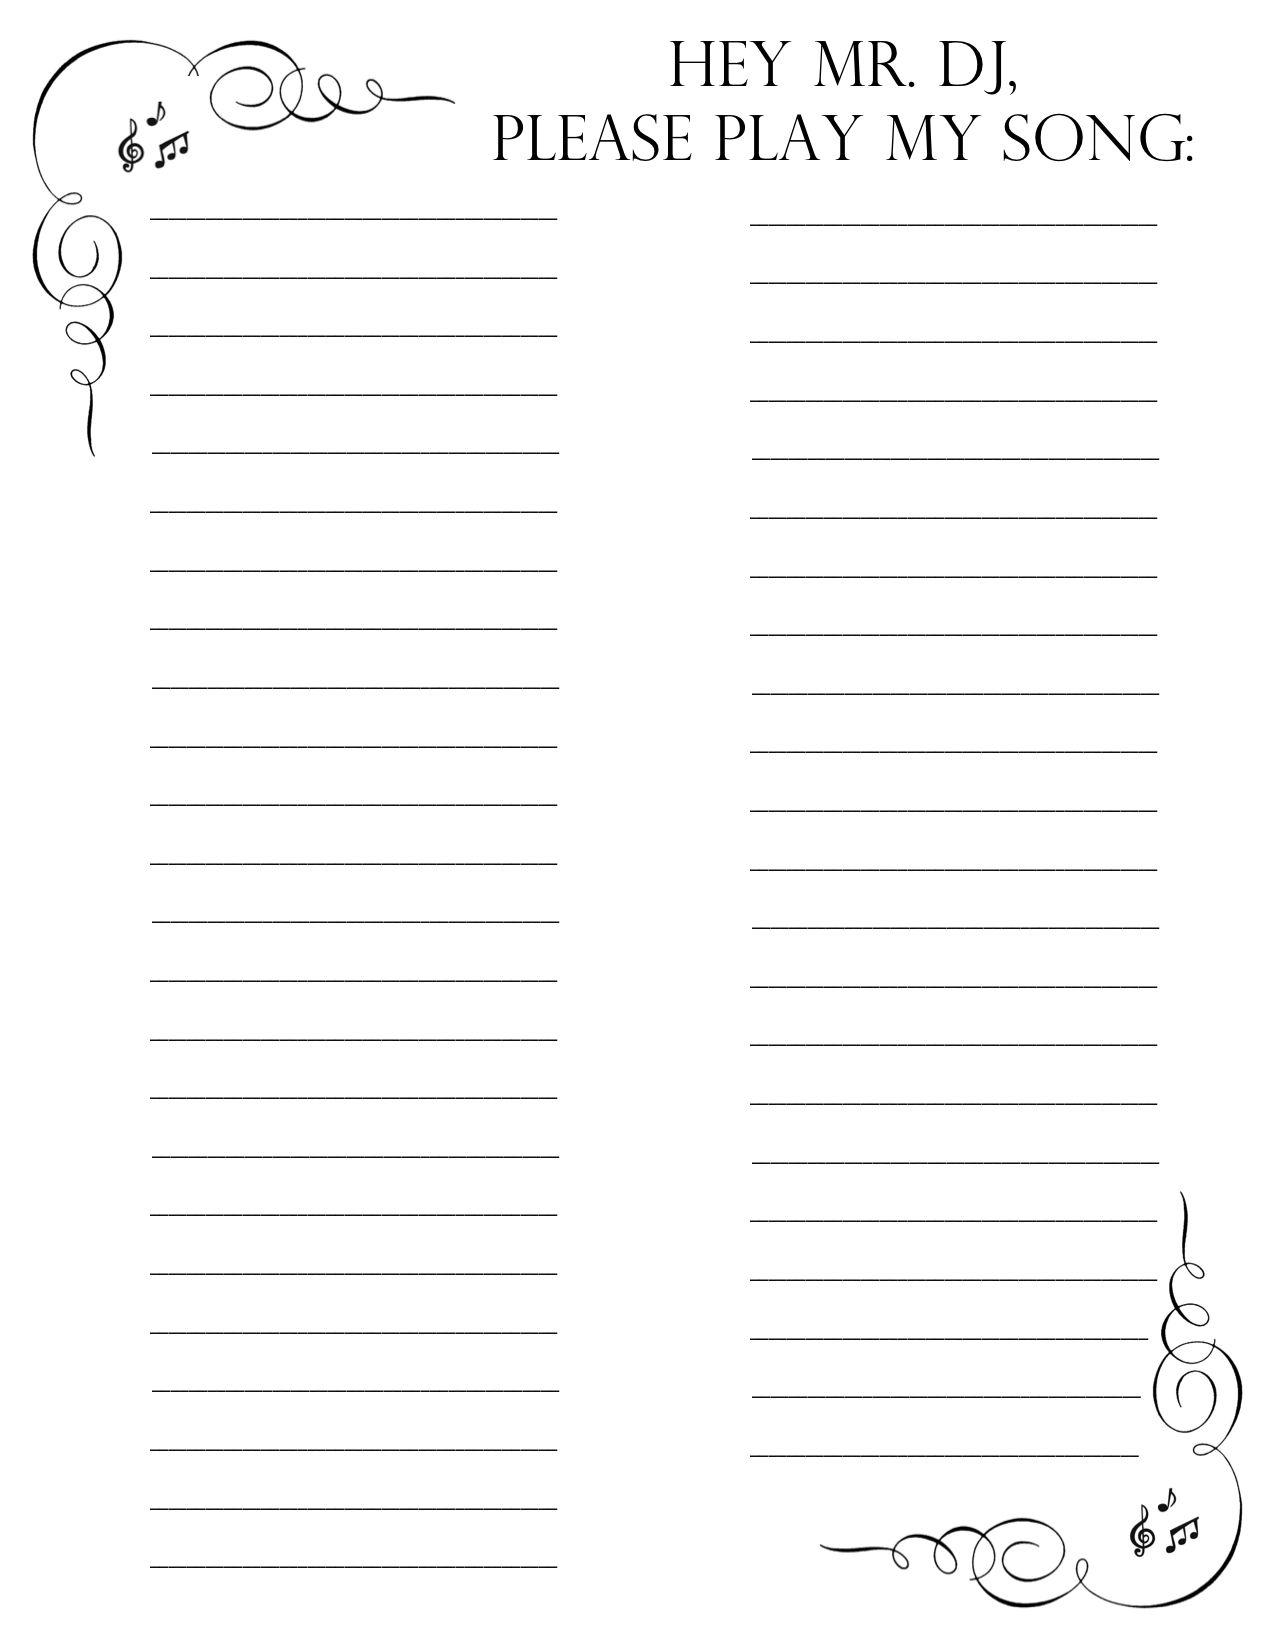 5 karaoke sign up sheet template